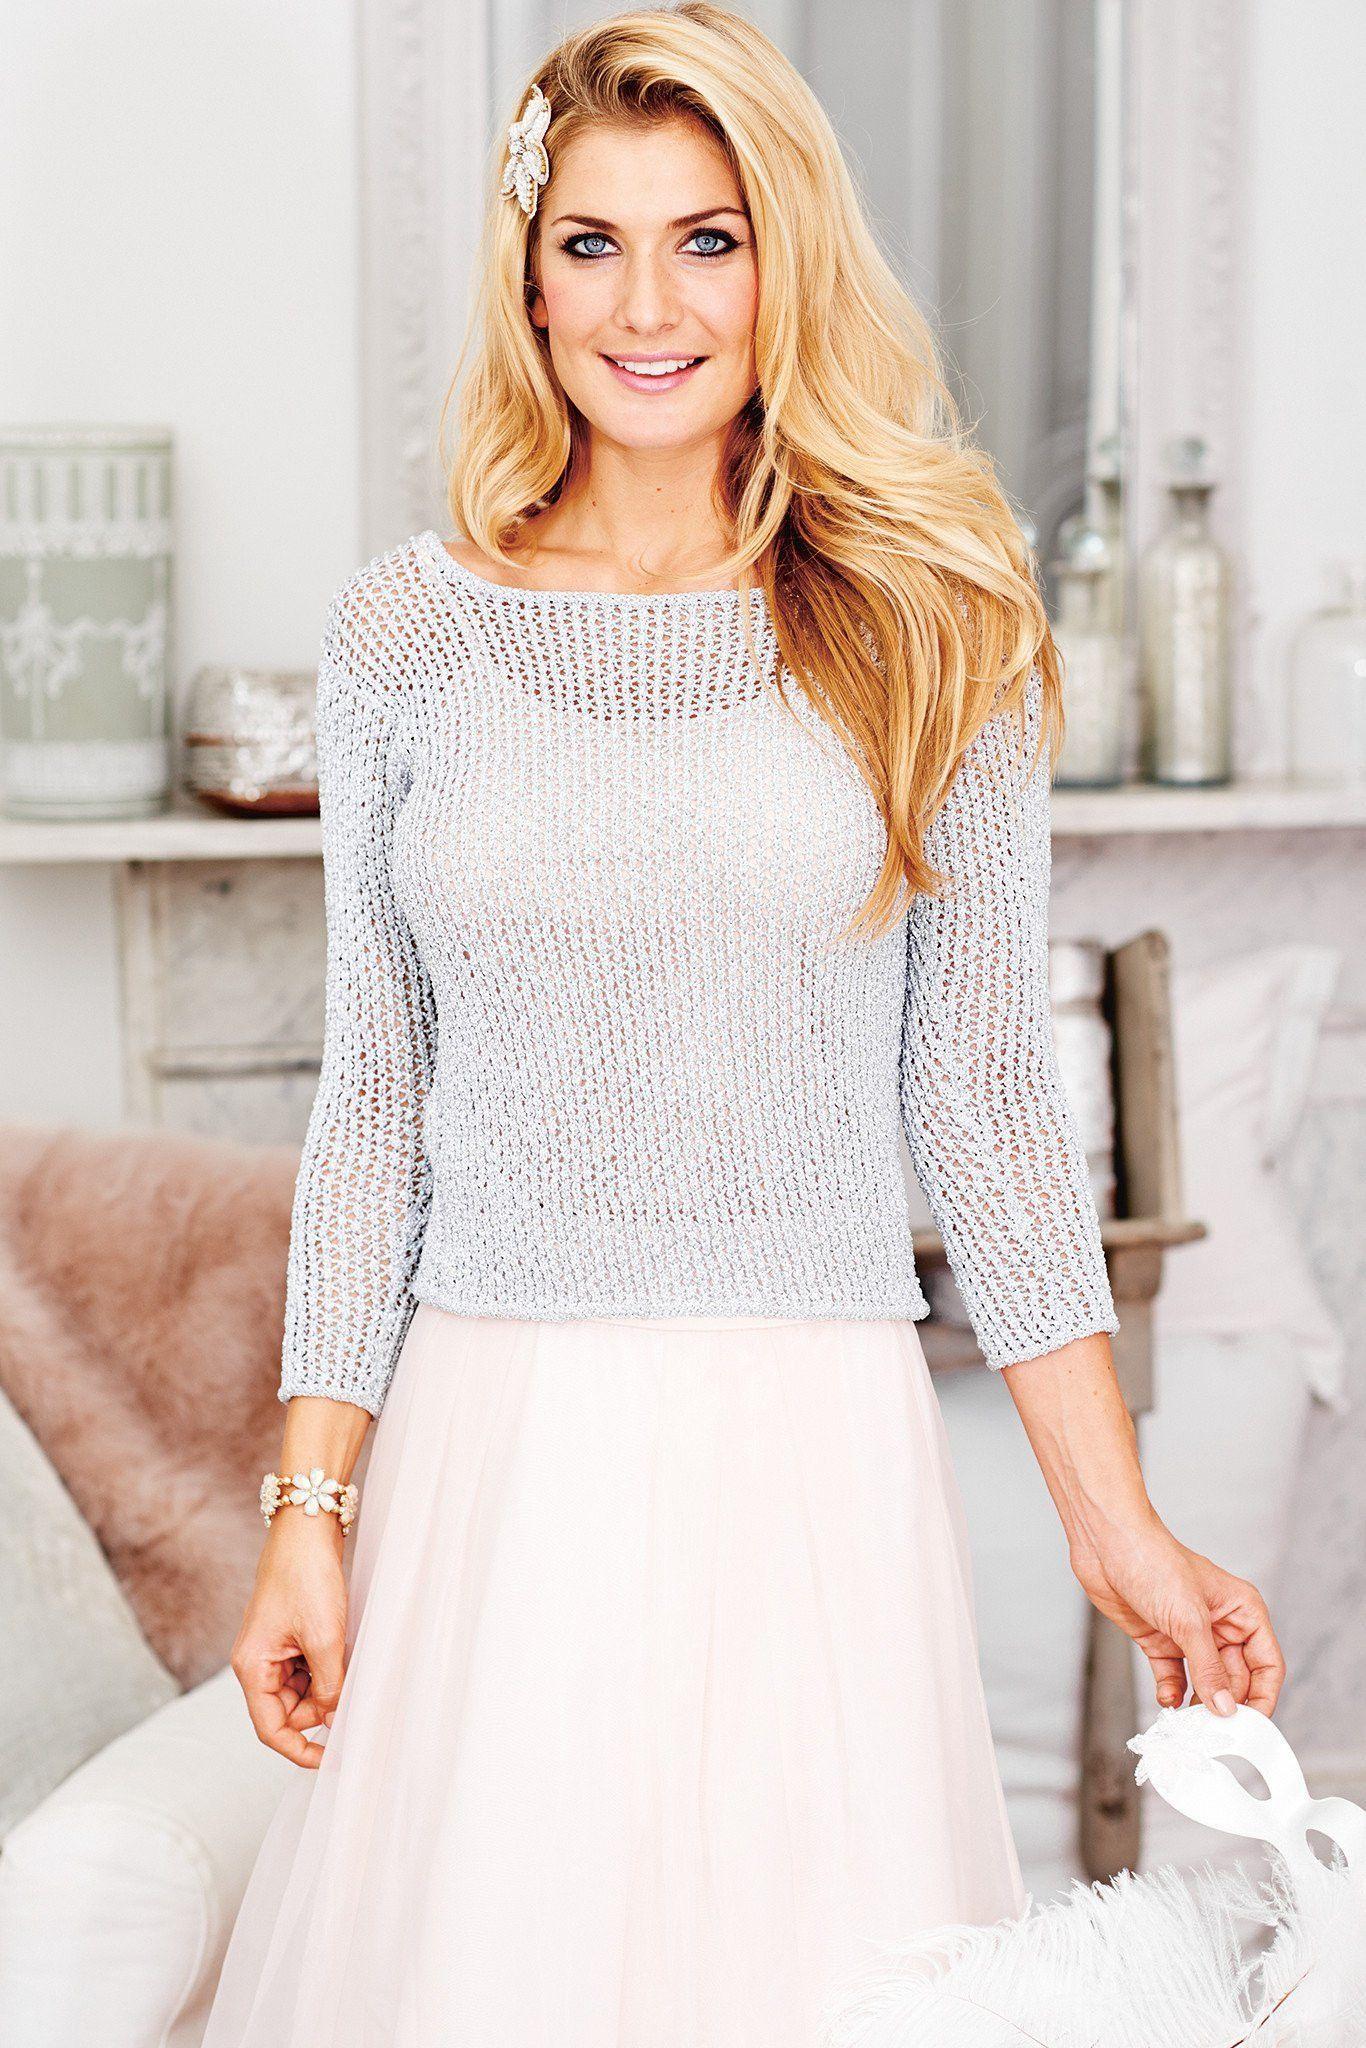 Womens Mesh Jumper Knitting Pattern | The Knitting Network